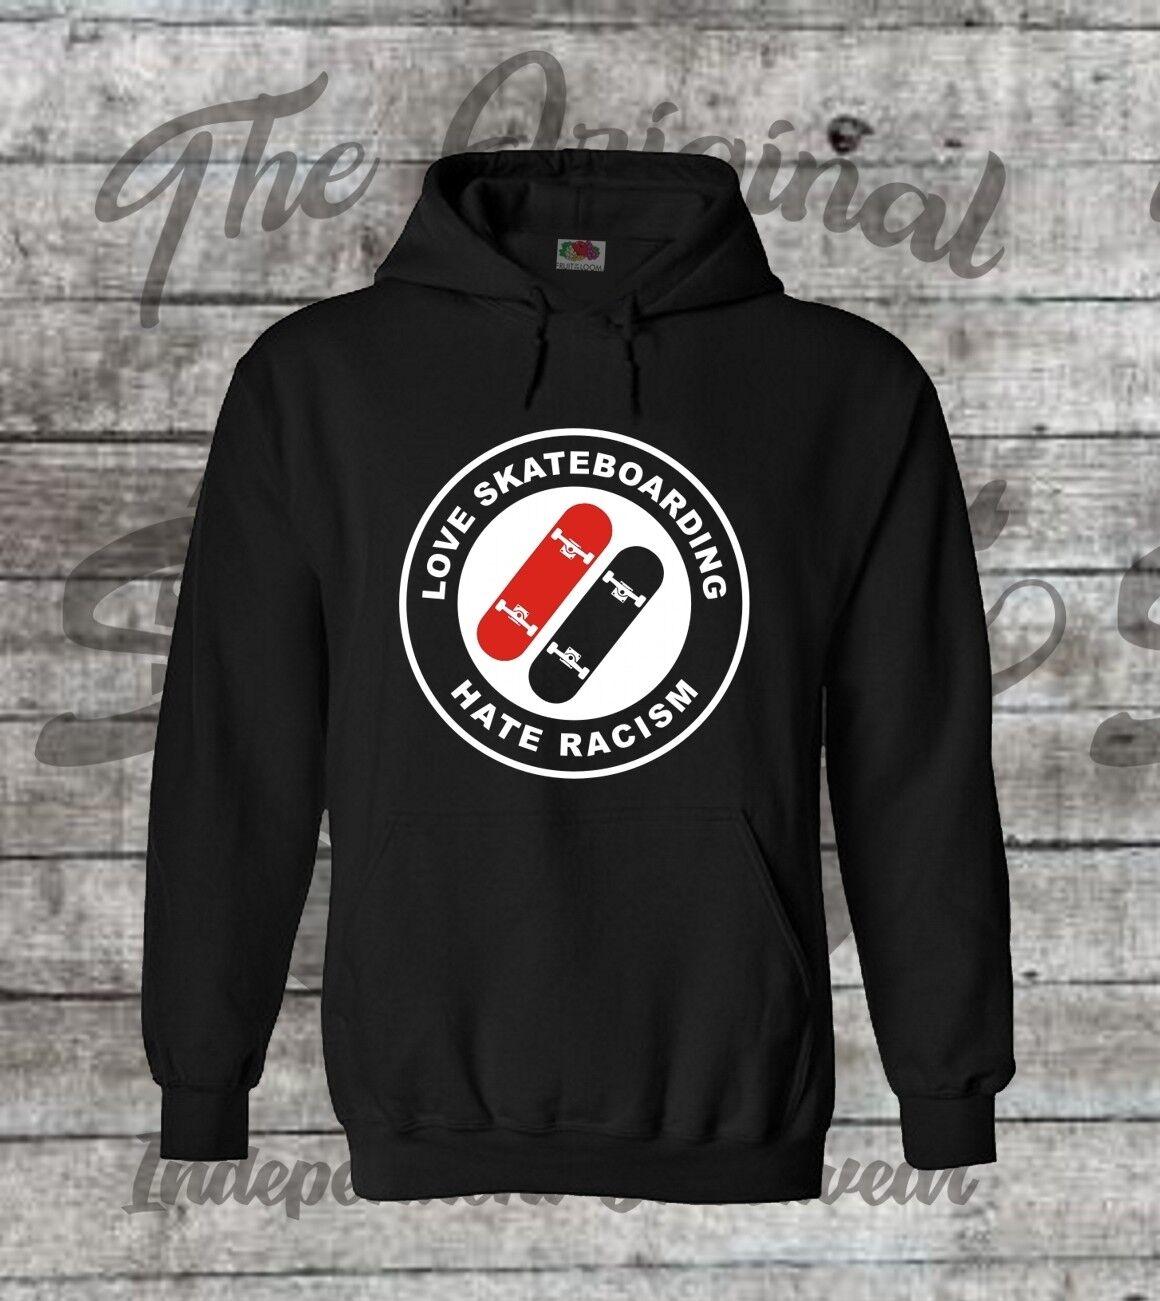 Hoodie / Kapuzenpullover / Antifaschist / Antifa / FCK NZS / Gegen Nazis / Punk